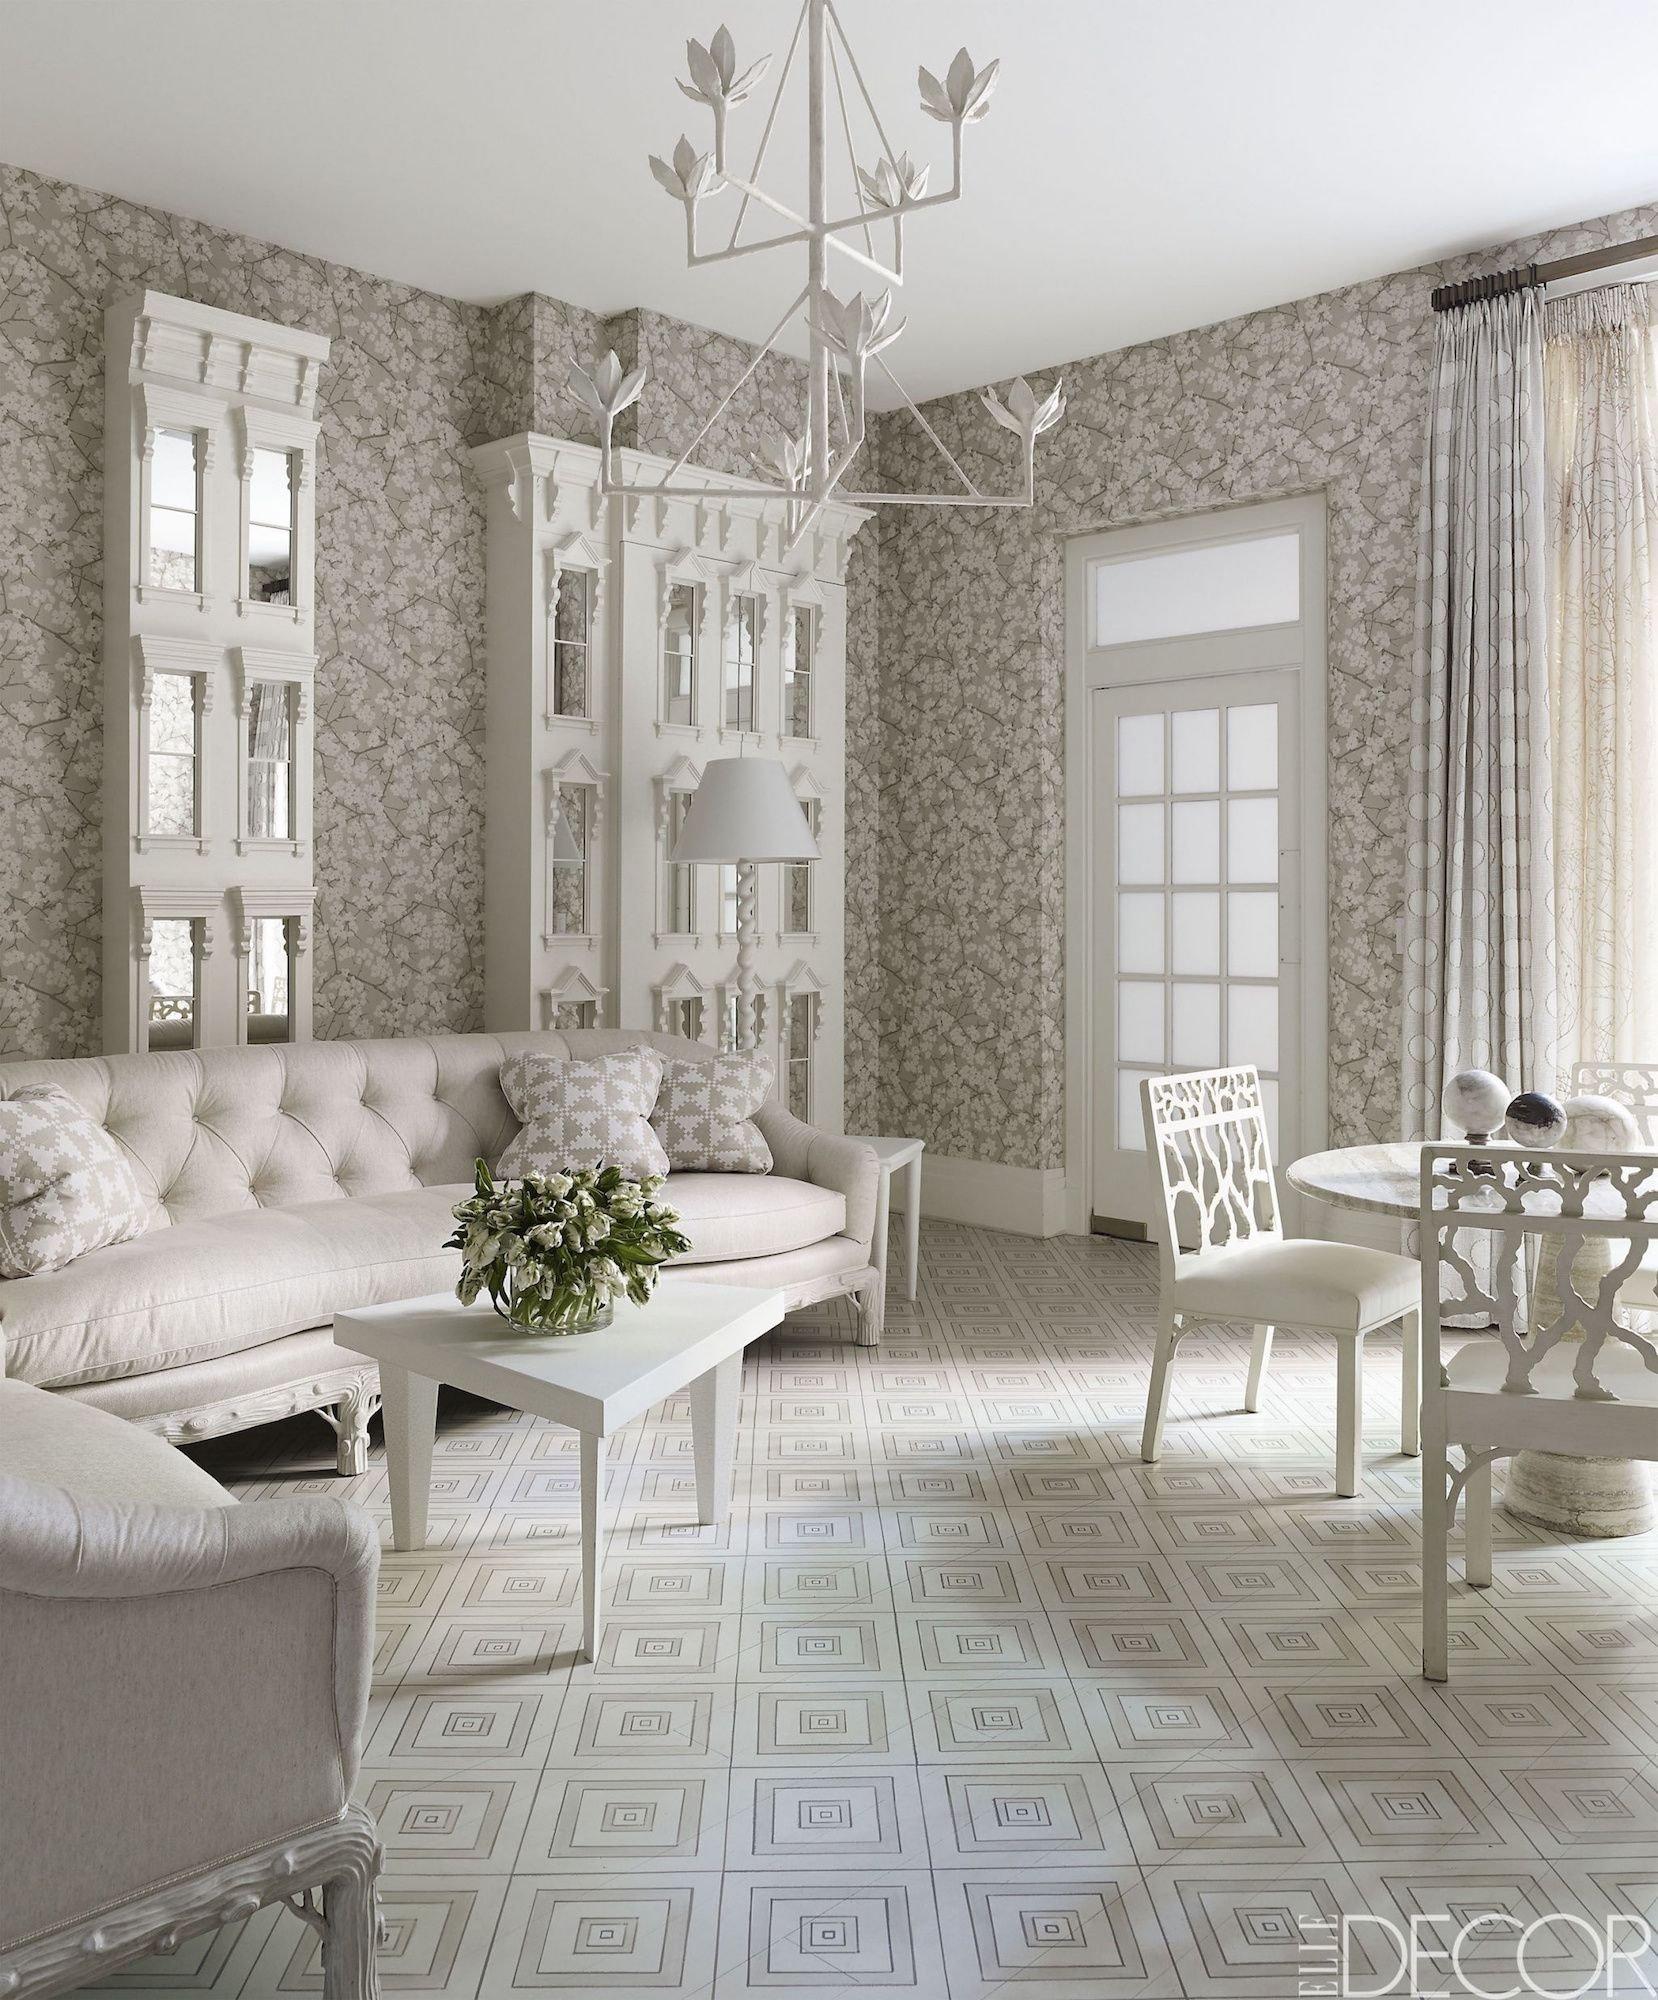 10 Spectacular Drapery Ideas For Living Room 40 living room curtains ideas window drapes for living rooms 1 2020